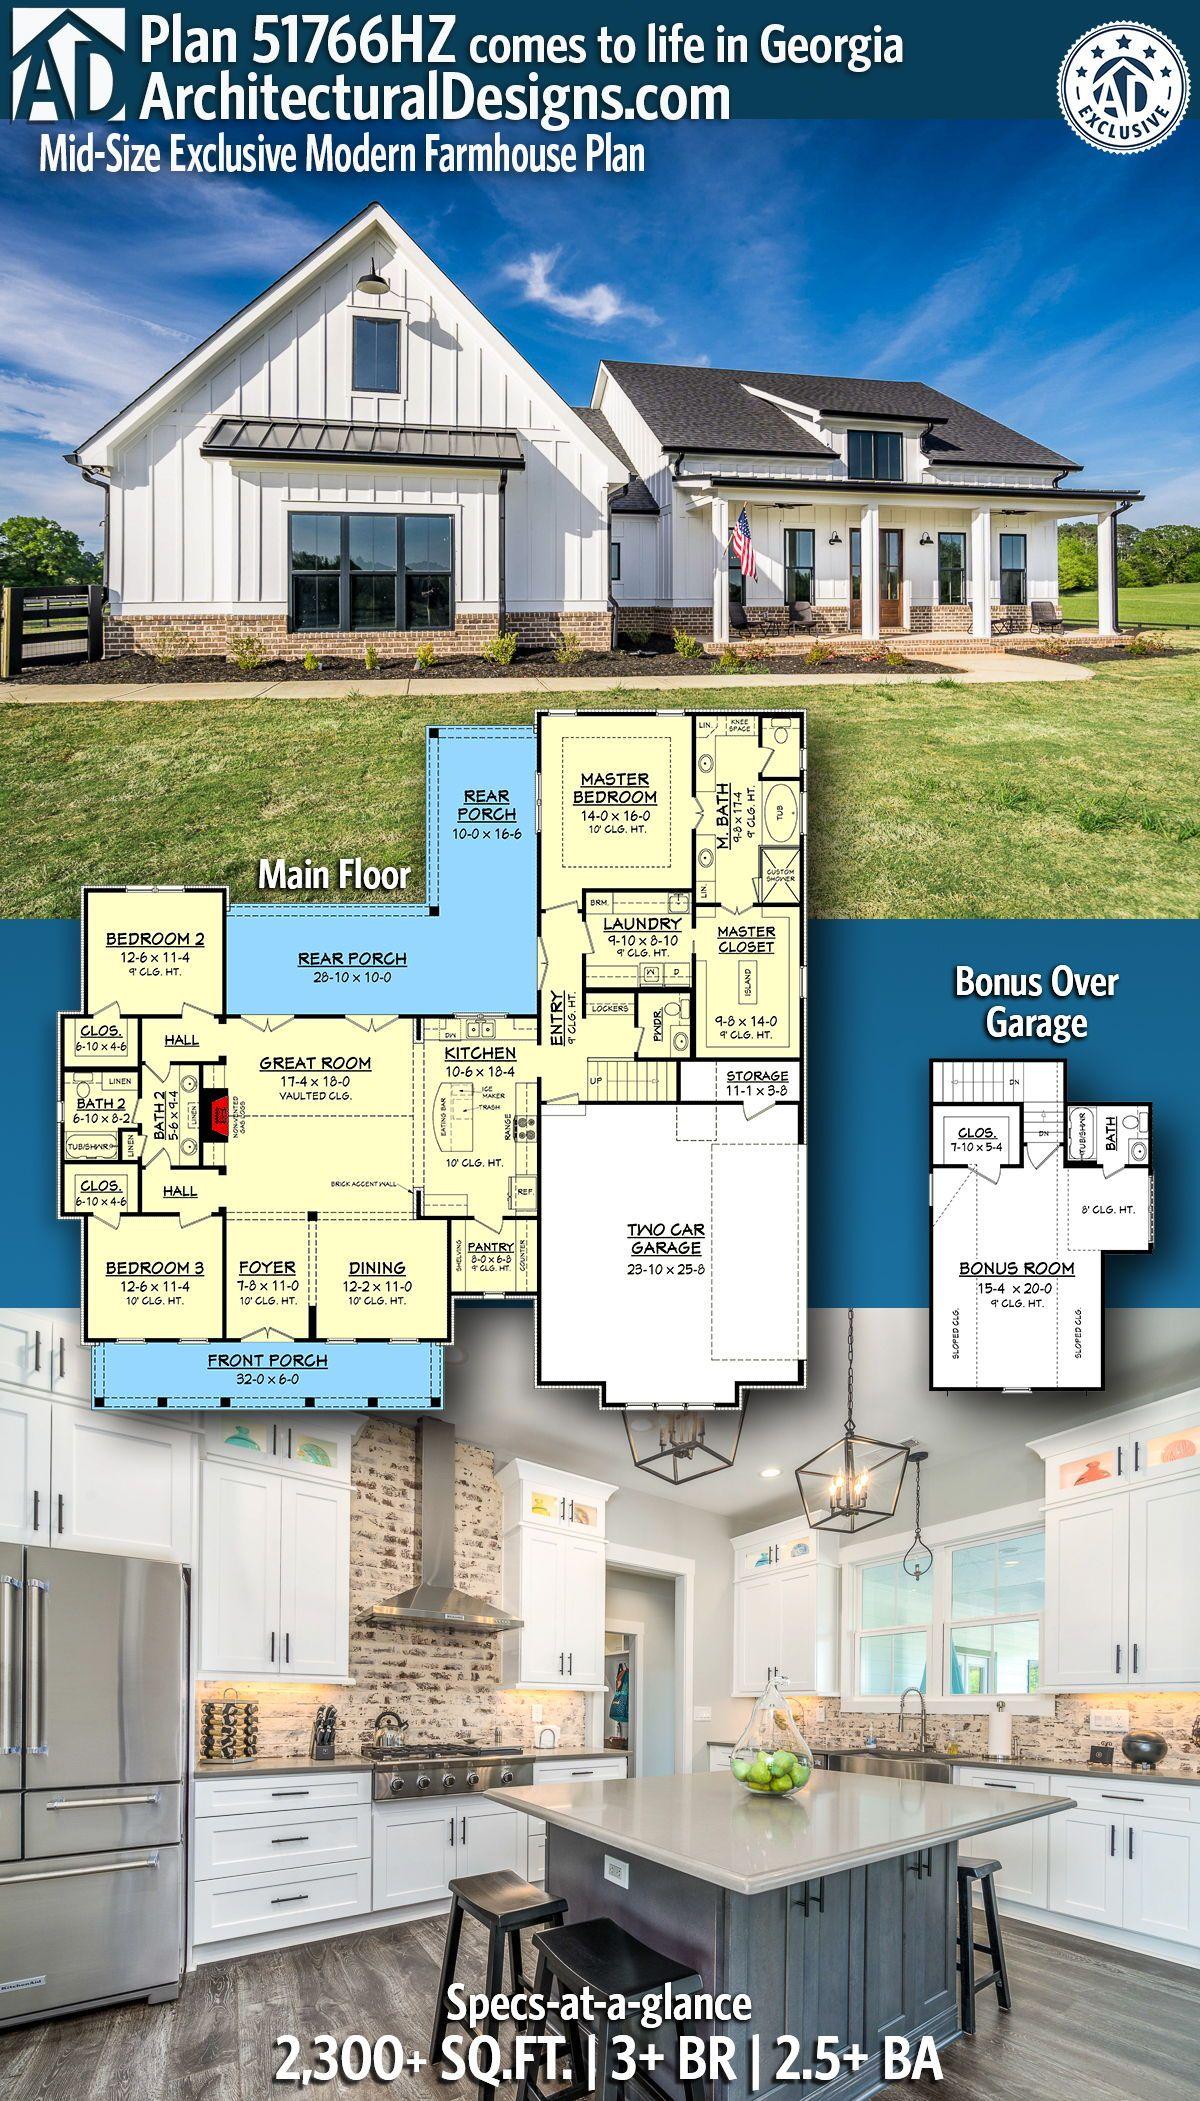 Plan 51766HZ: Mid-Size Exclusive Modern Farmhouse Plan in ...